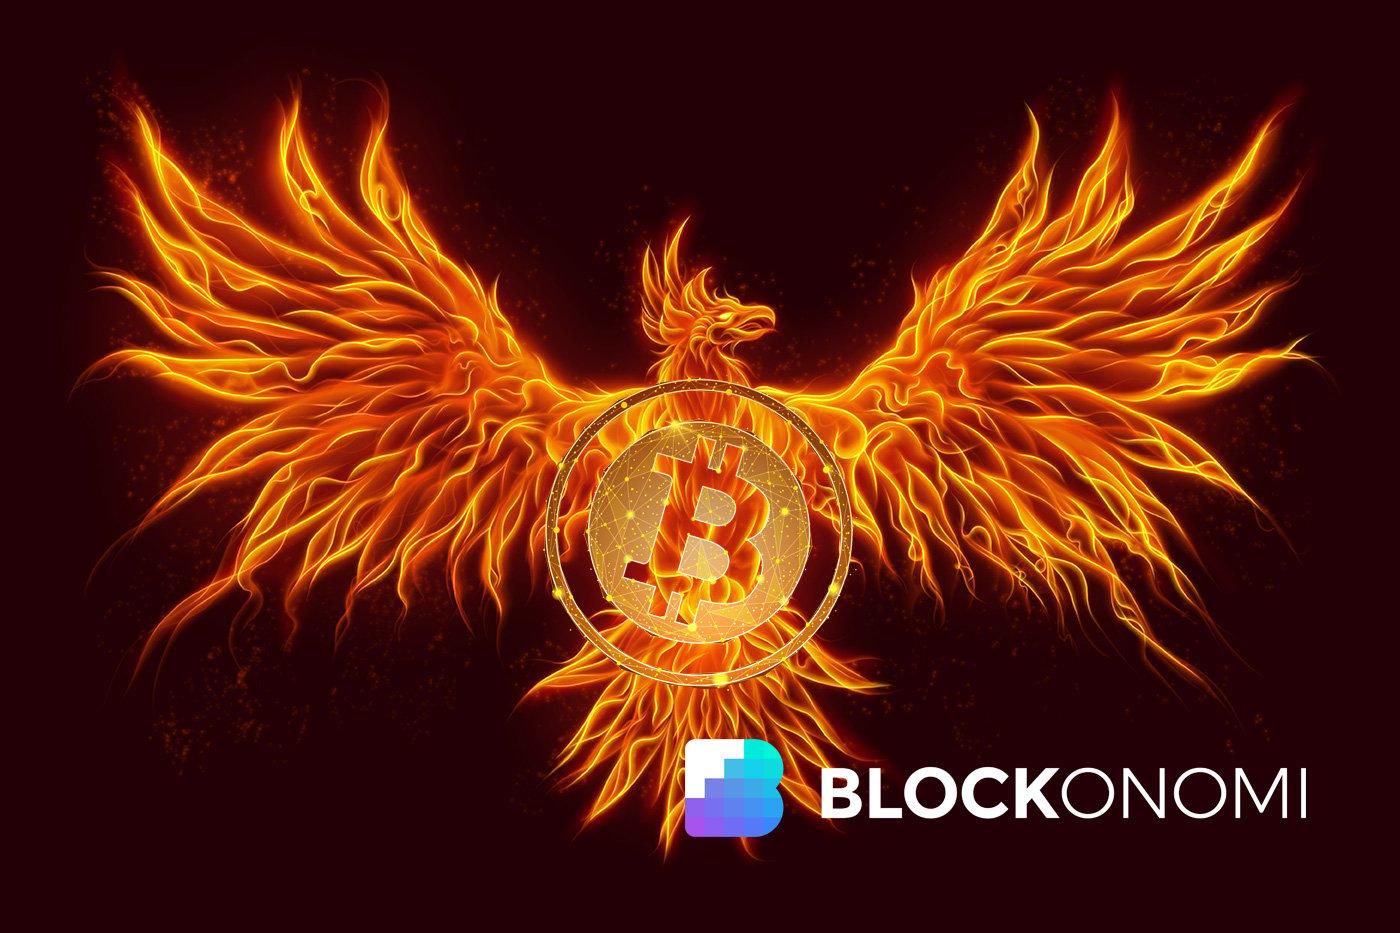 Bitcoin Price Will Rise